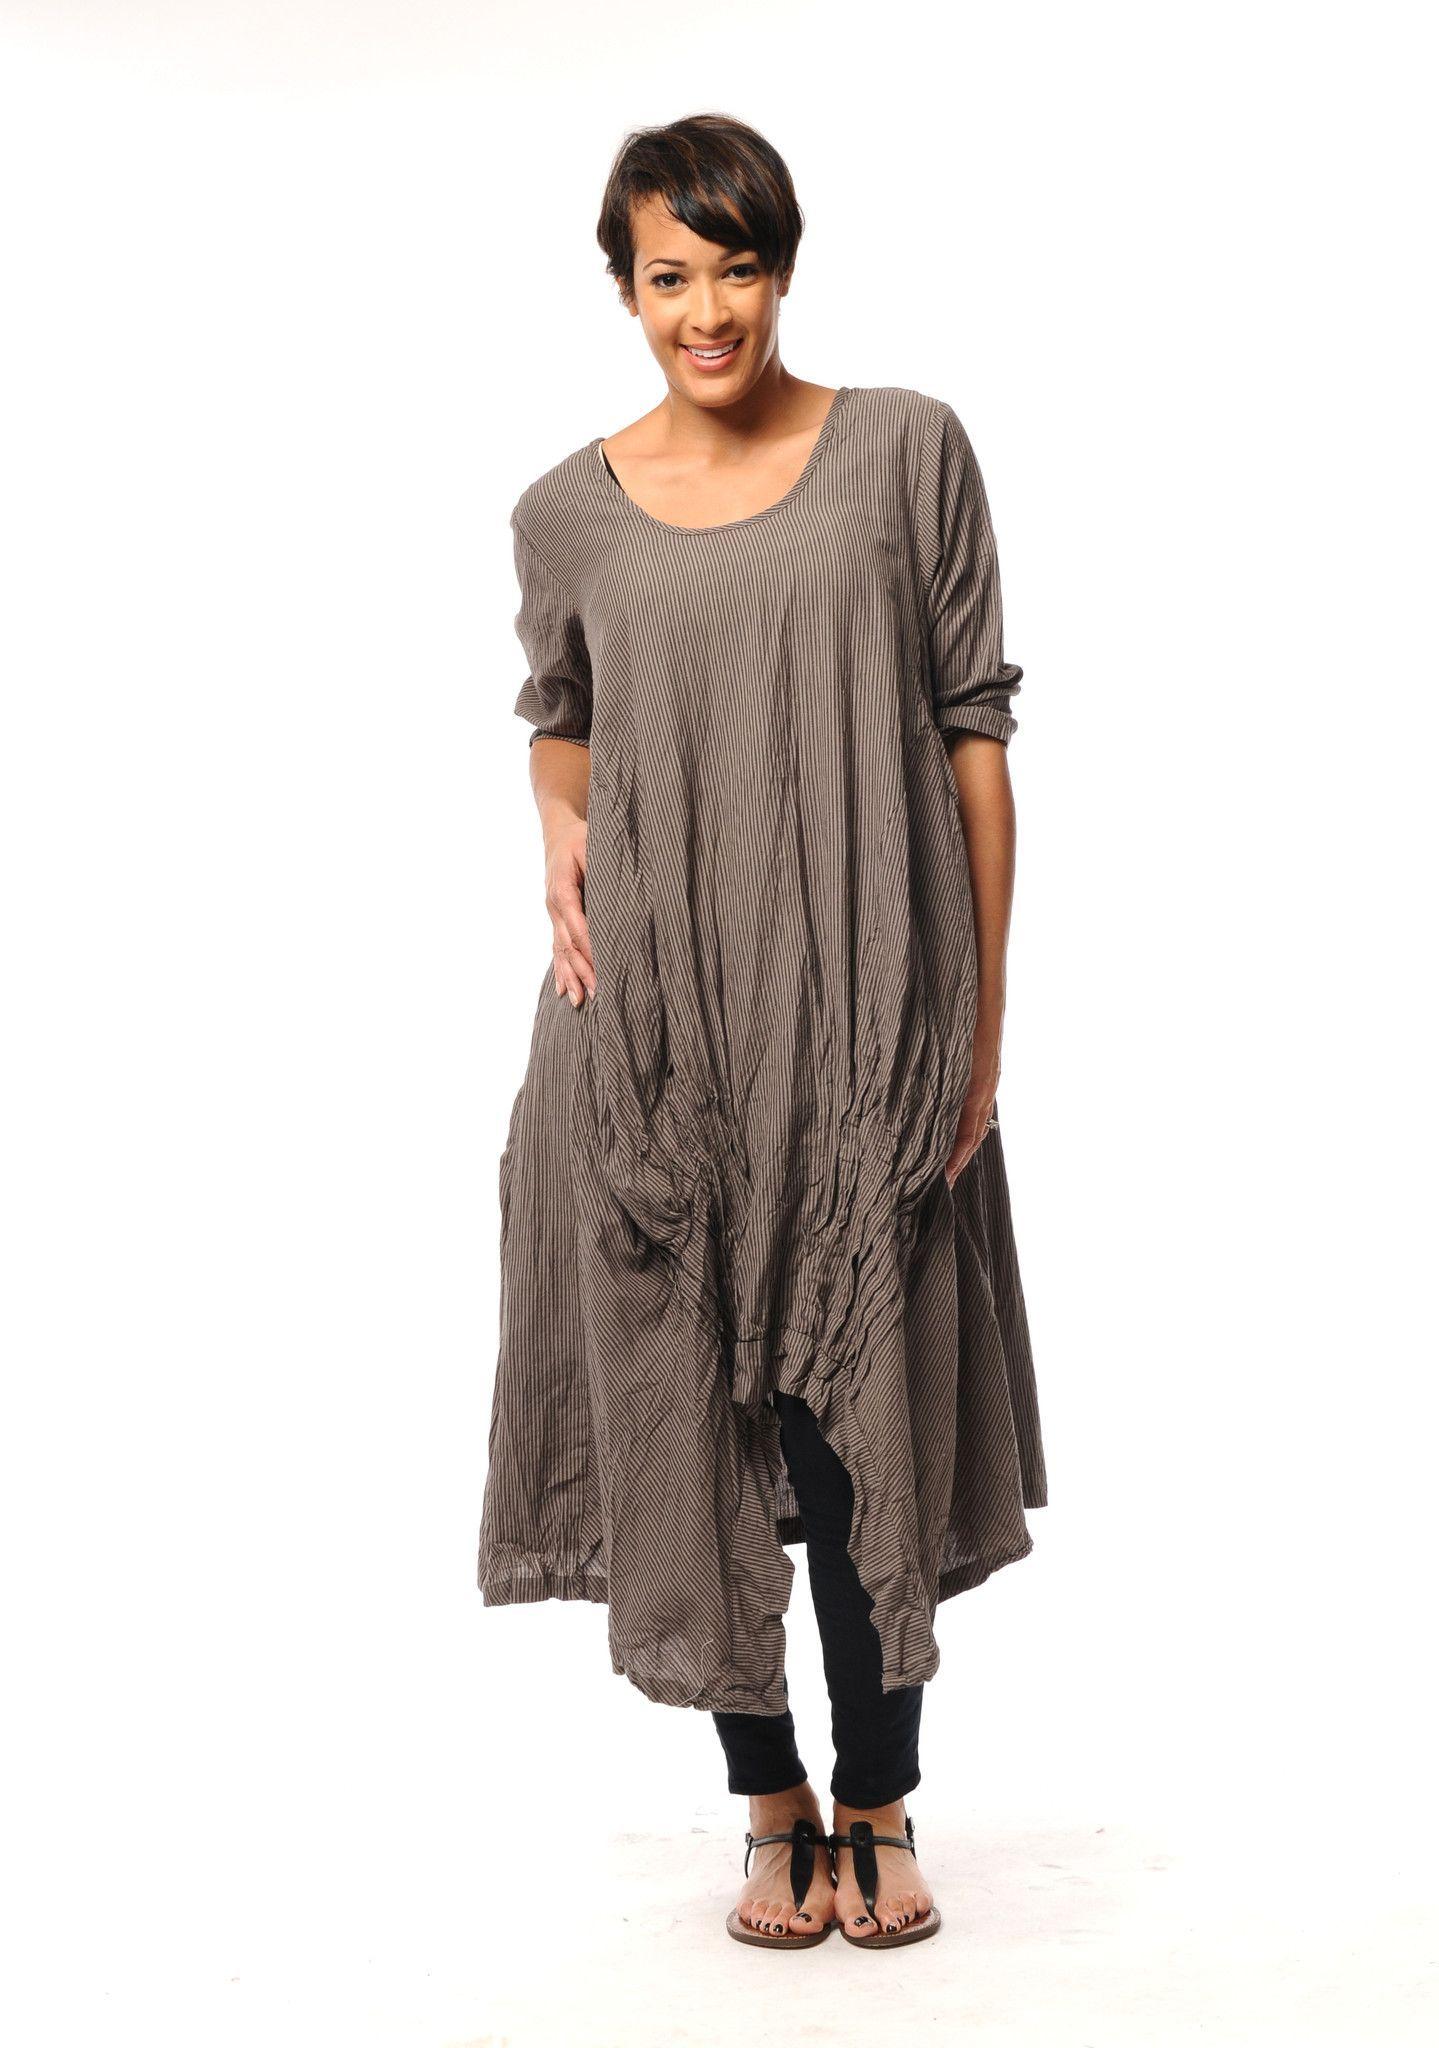 5d0efff550 Tulip Lexi Dress - Dune Stripe